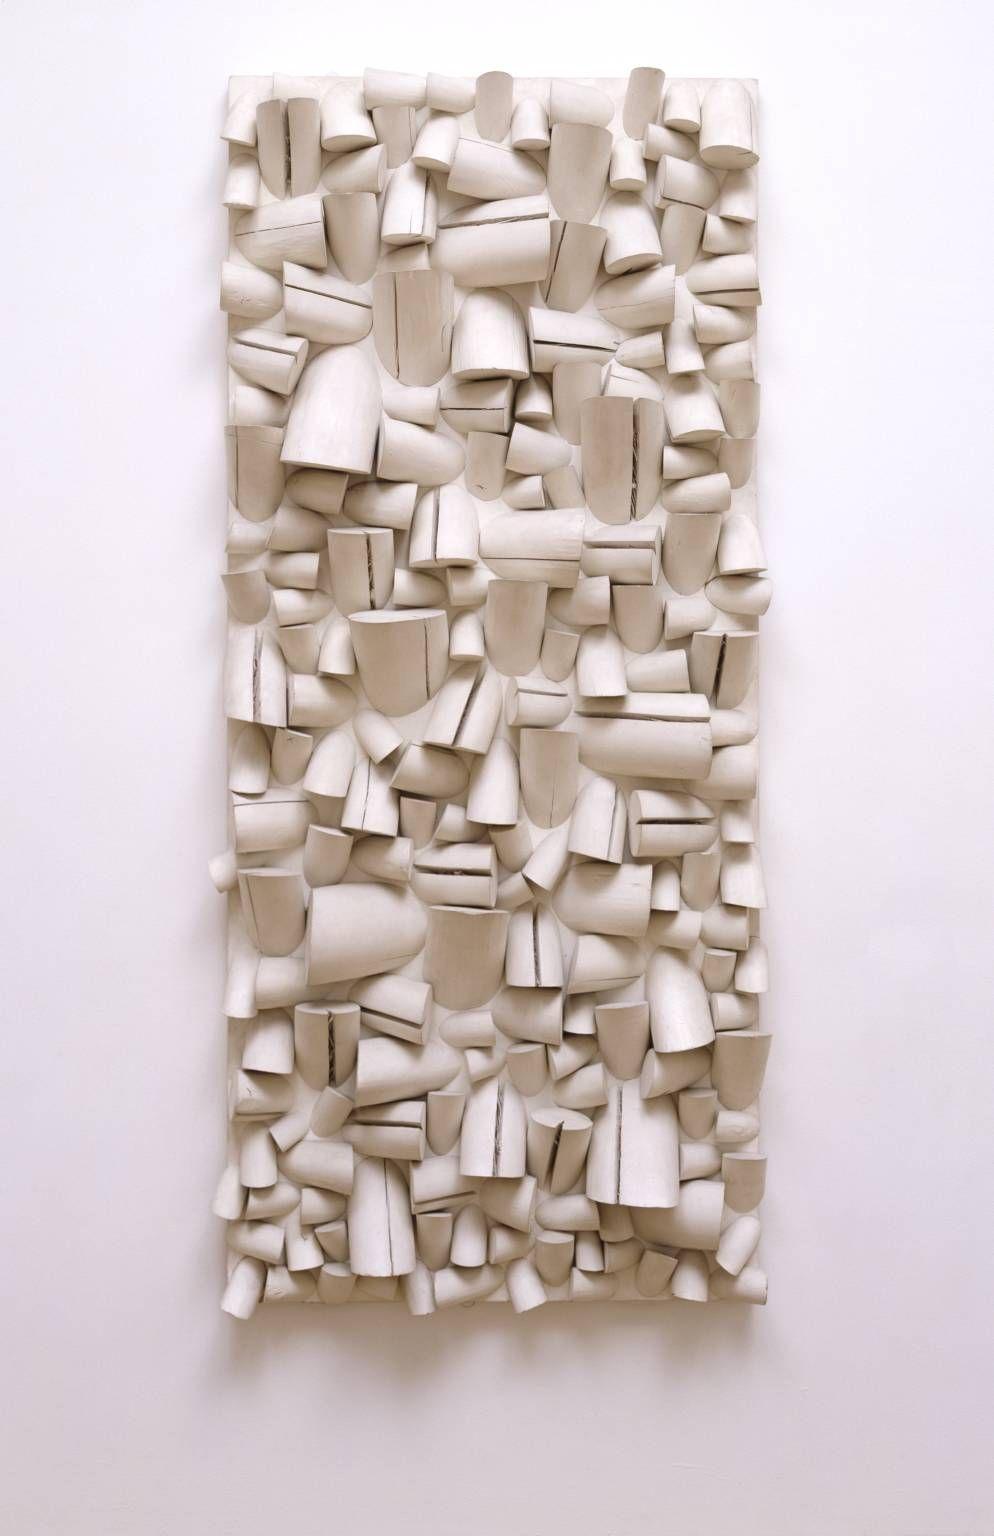 Sergio de Camargo, 'Large Split Relief No.34/4/74' 1964-5